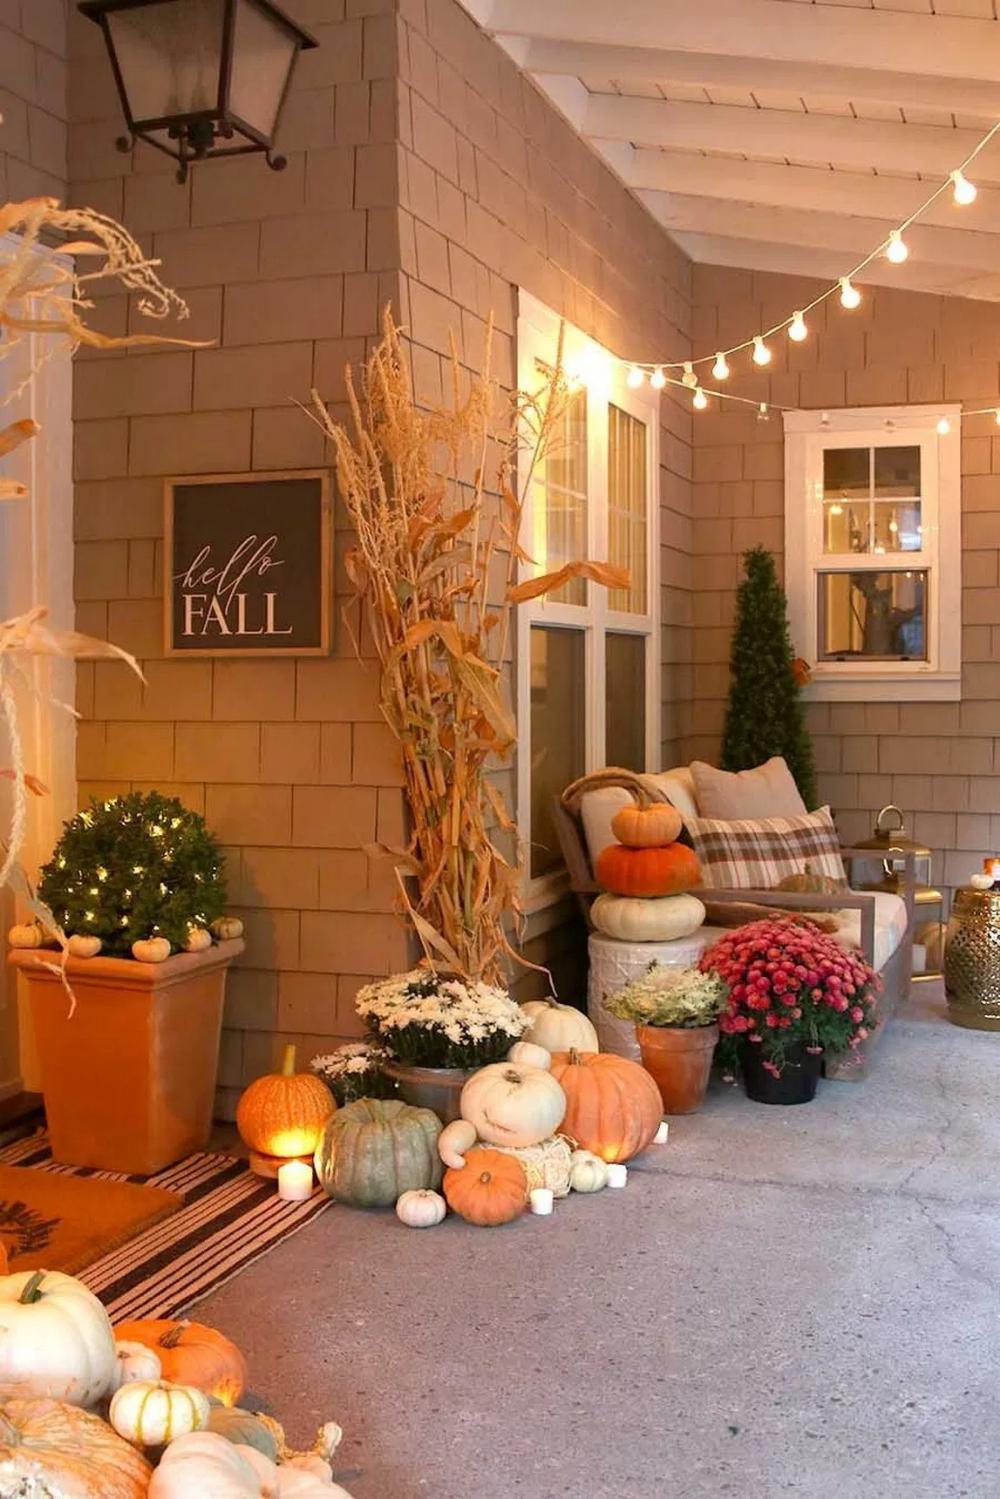 10 Gorgeous Farmhouse Front Porch Decorating Ideas 10   Fall ...